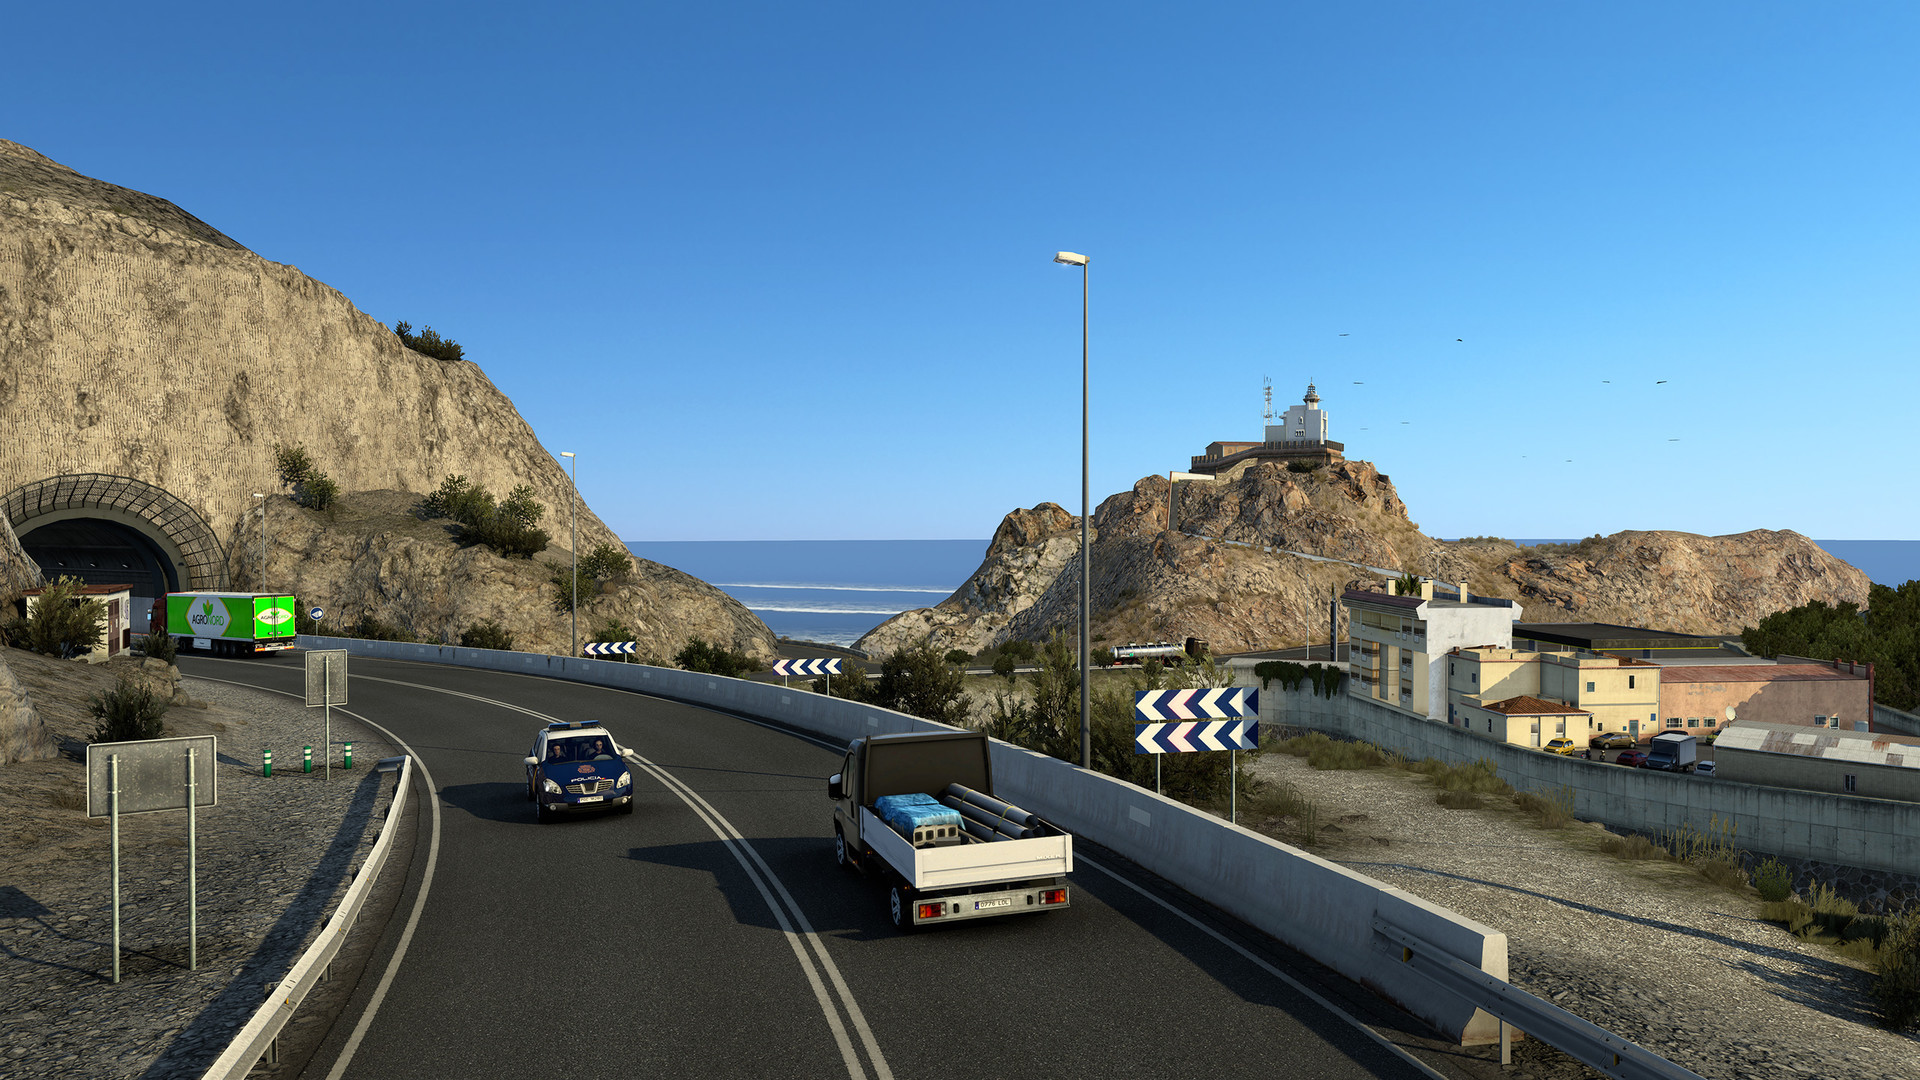 Euro Truck Simulator 2's Iberia is a Steam top seller